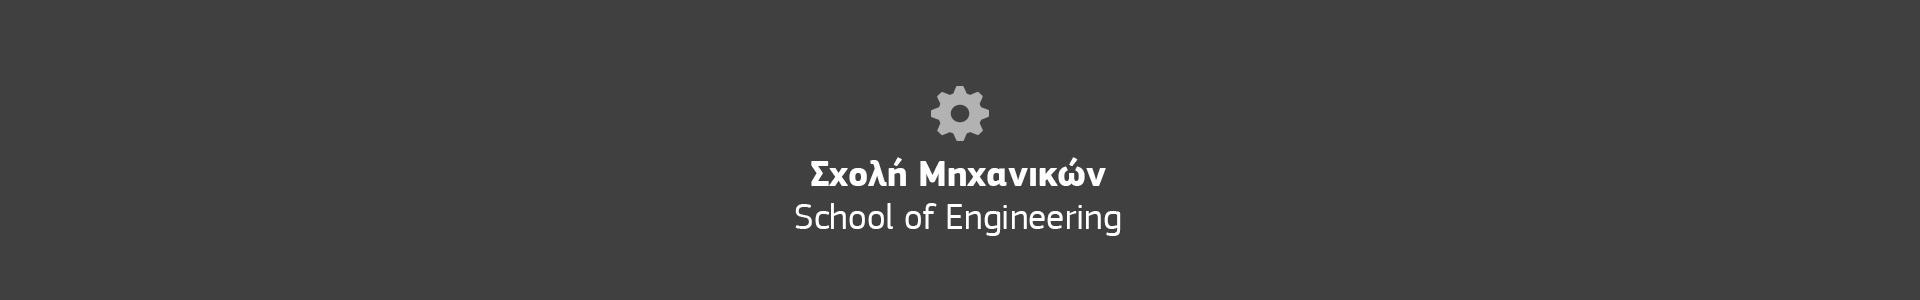 1920x300_engineering